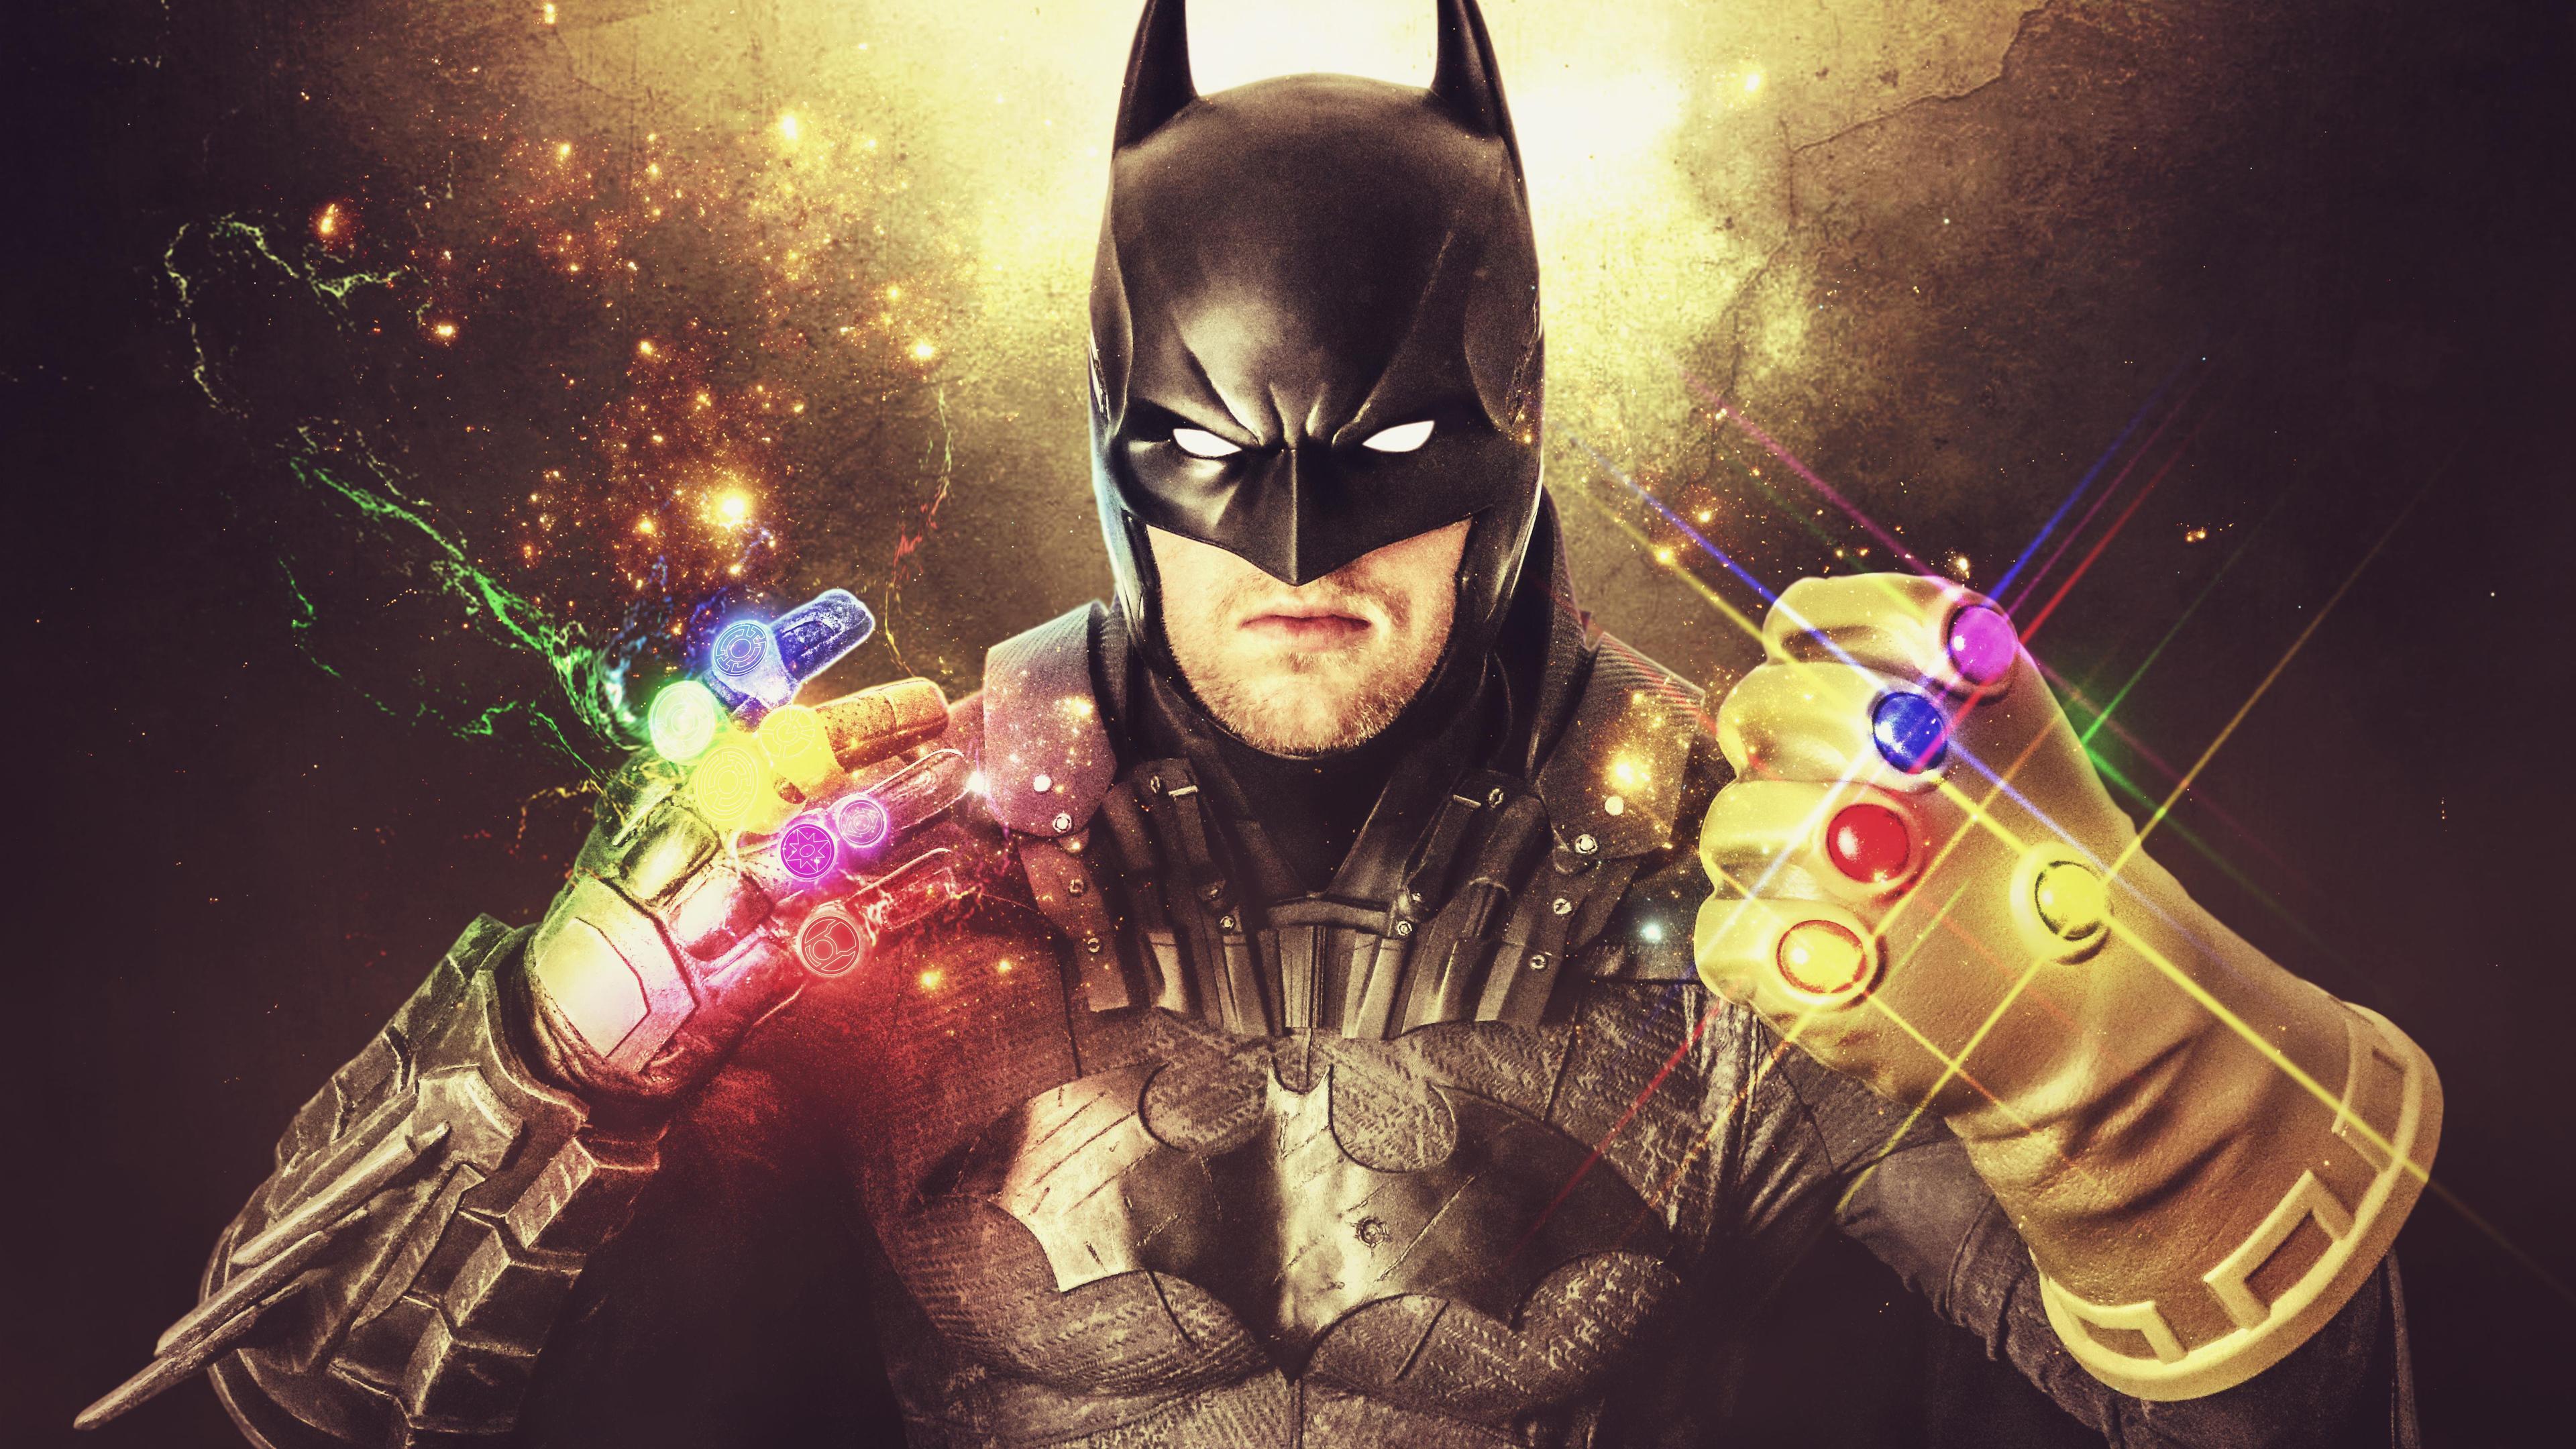 batman with thanos gauntlet 4k 1557260142 - Batman With Thanos Gauntlet 4k - superheroes wallpapers, hd-wallpapers, digital art wallpapers, batman wallpapers, 4k-wallpapers